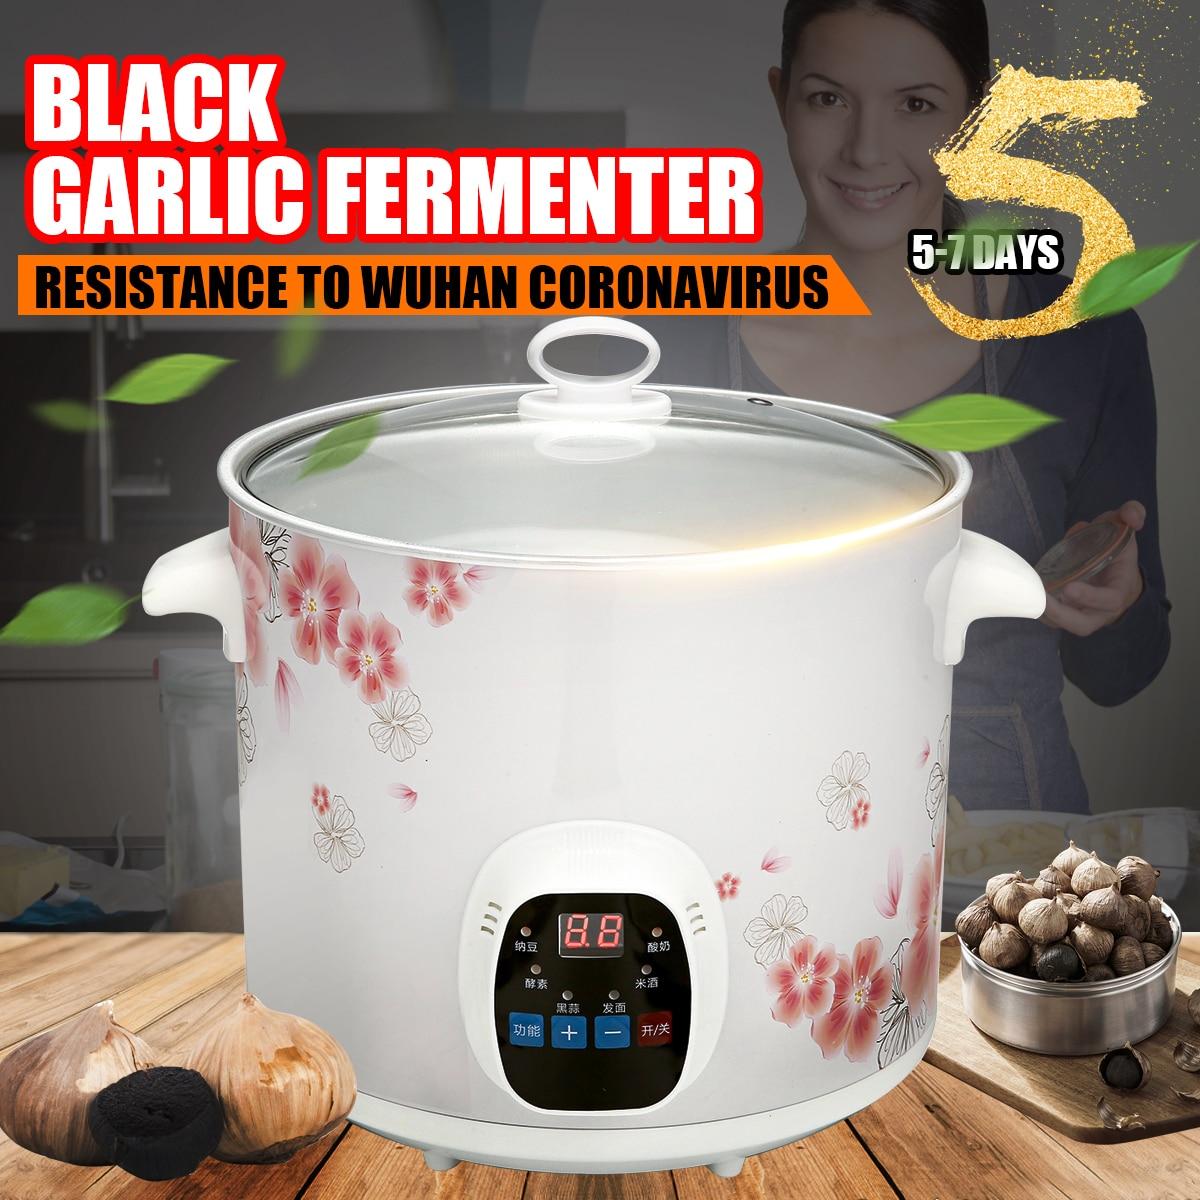 6L Large Capacity Black Garlic Fermenter Black Garlic Ferment Box Smart Fermentation Machine Intelligent Control Garlics Maker